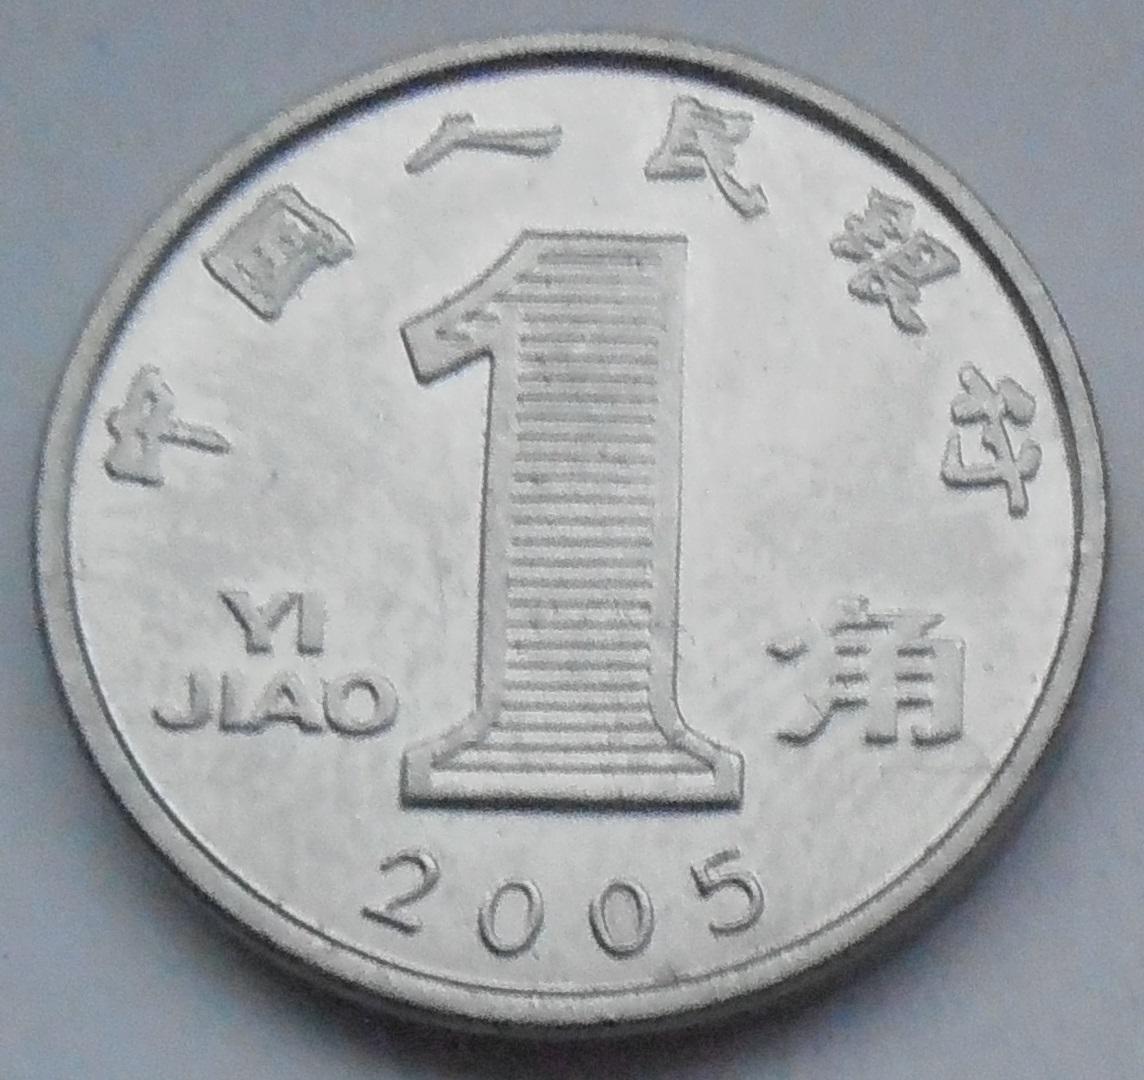 2005r. - Chiny - 1 Jiao